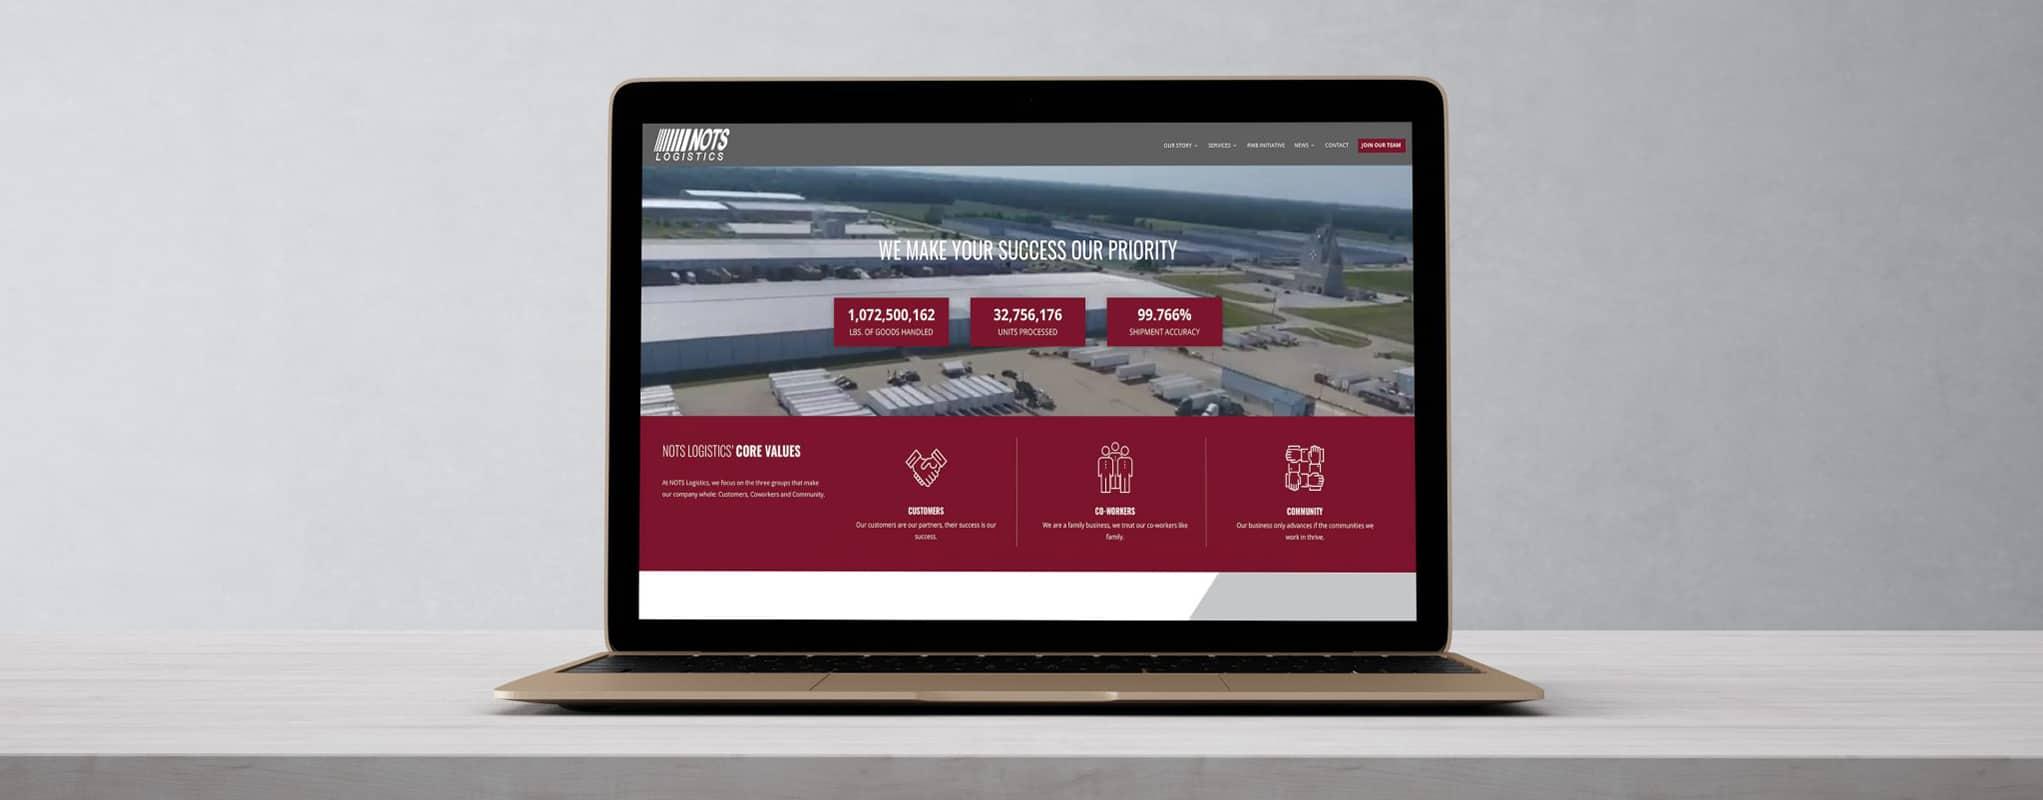 NOTS logistics website pulled up on laptop sitting on modern gray concrete desk